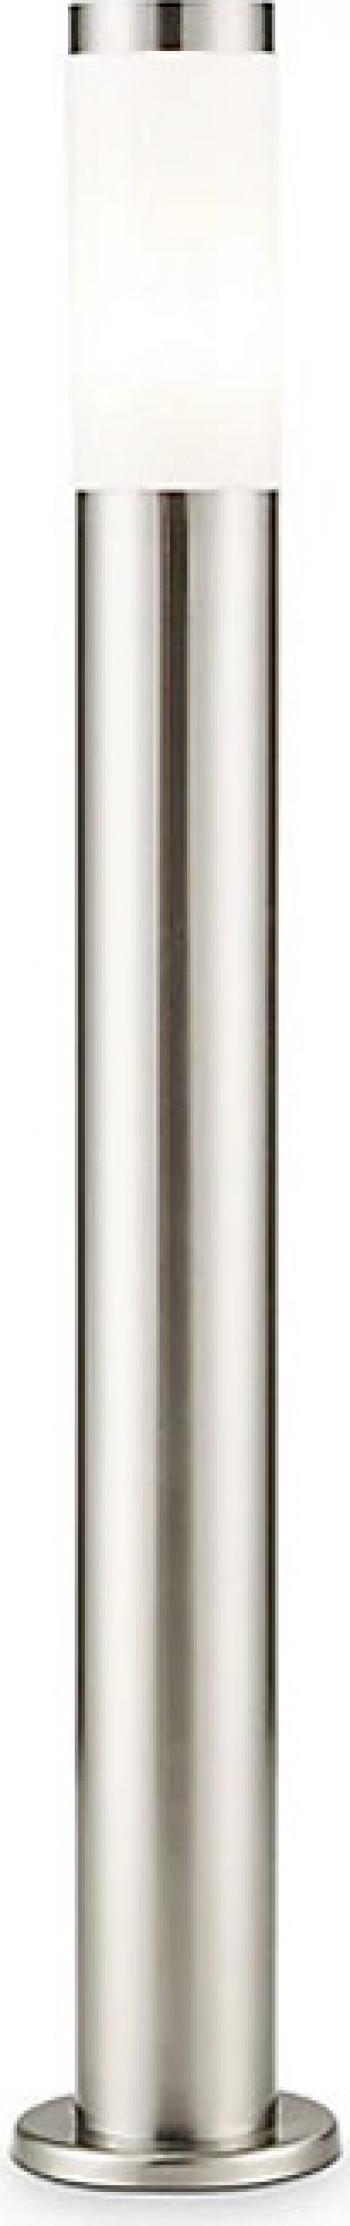 Stalp exterior cu finisaj cromat putere maxima 15 W inaltime 80 cm